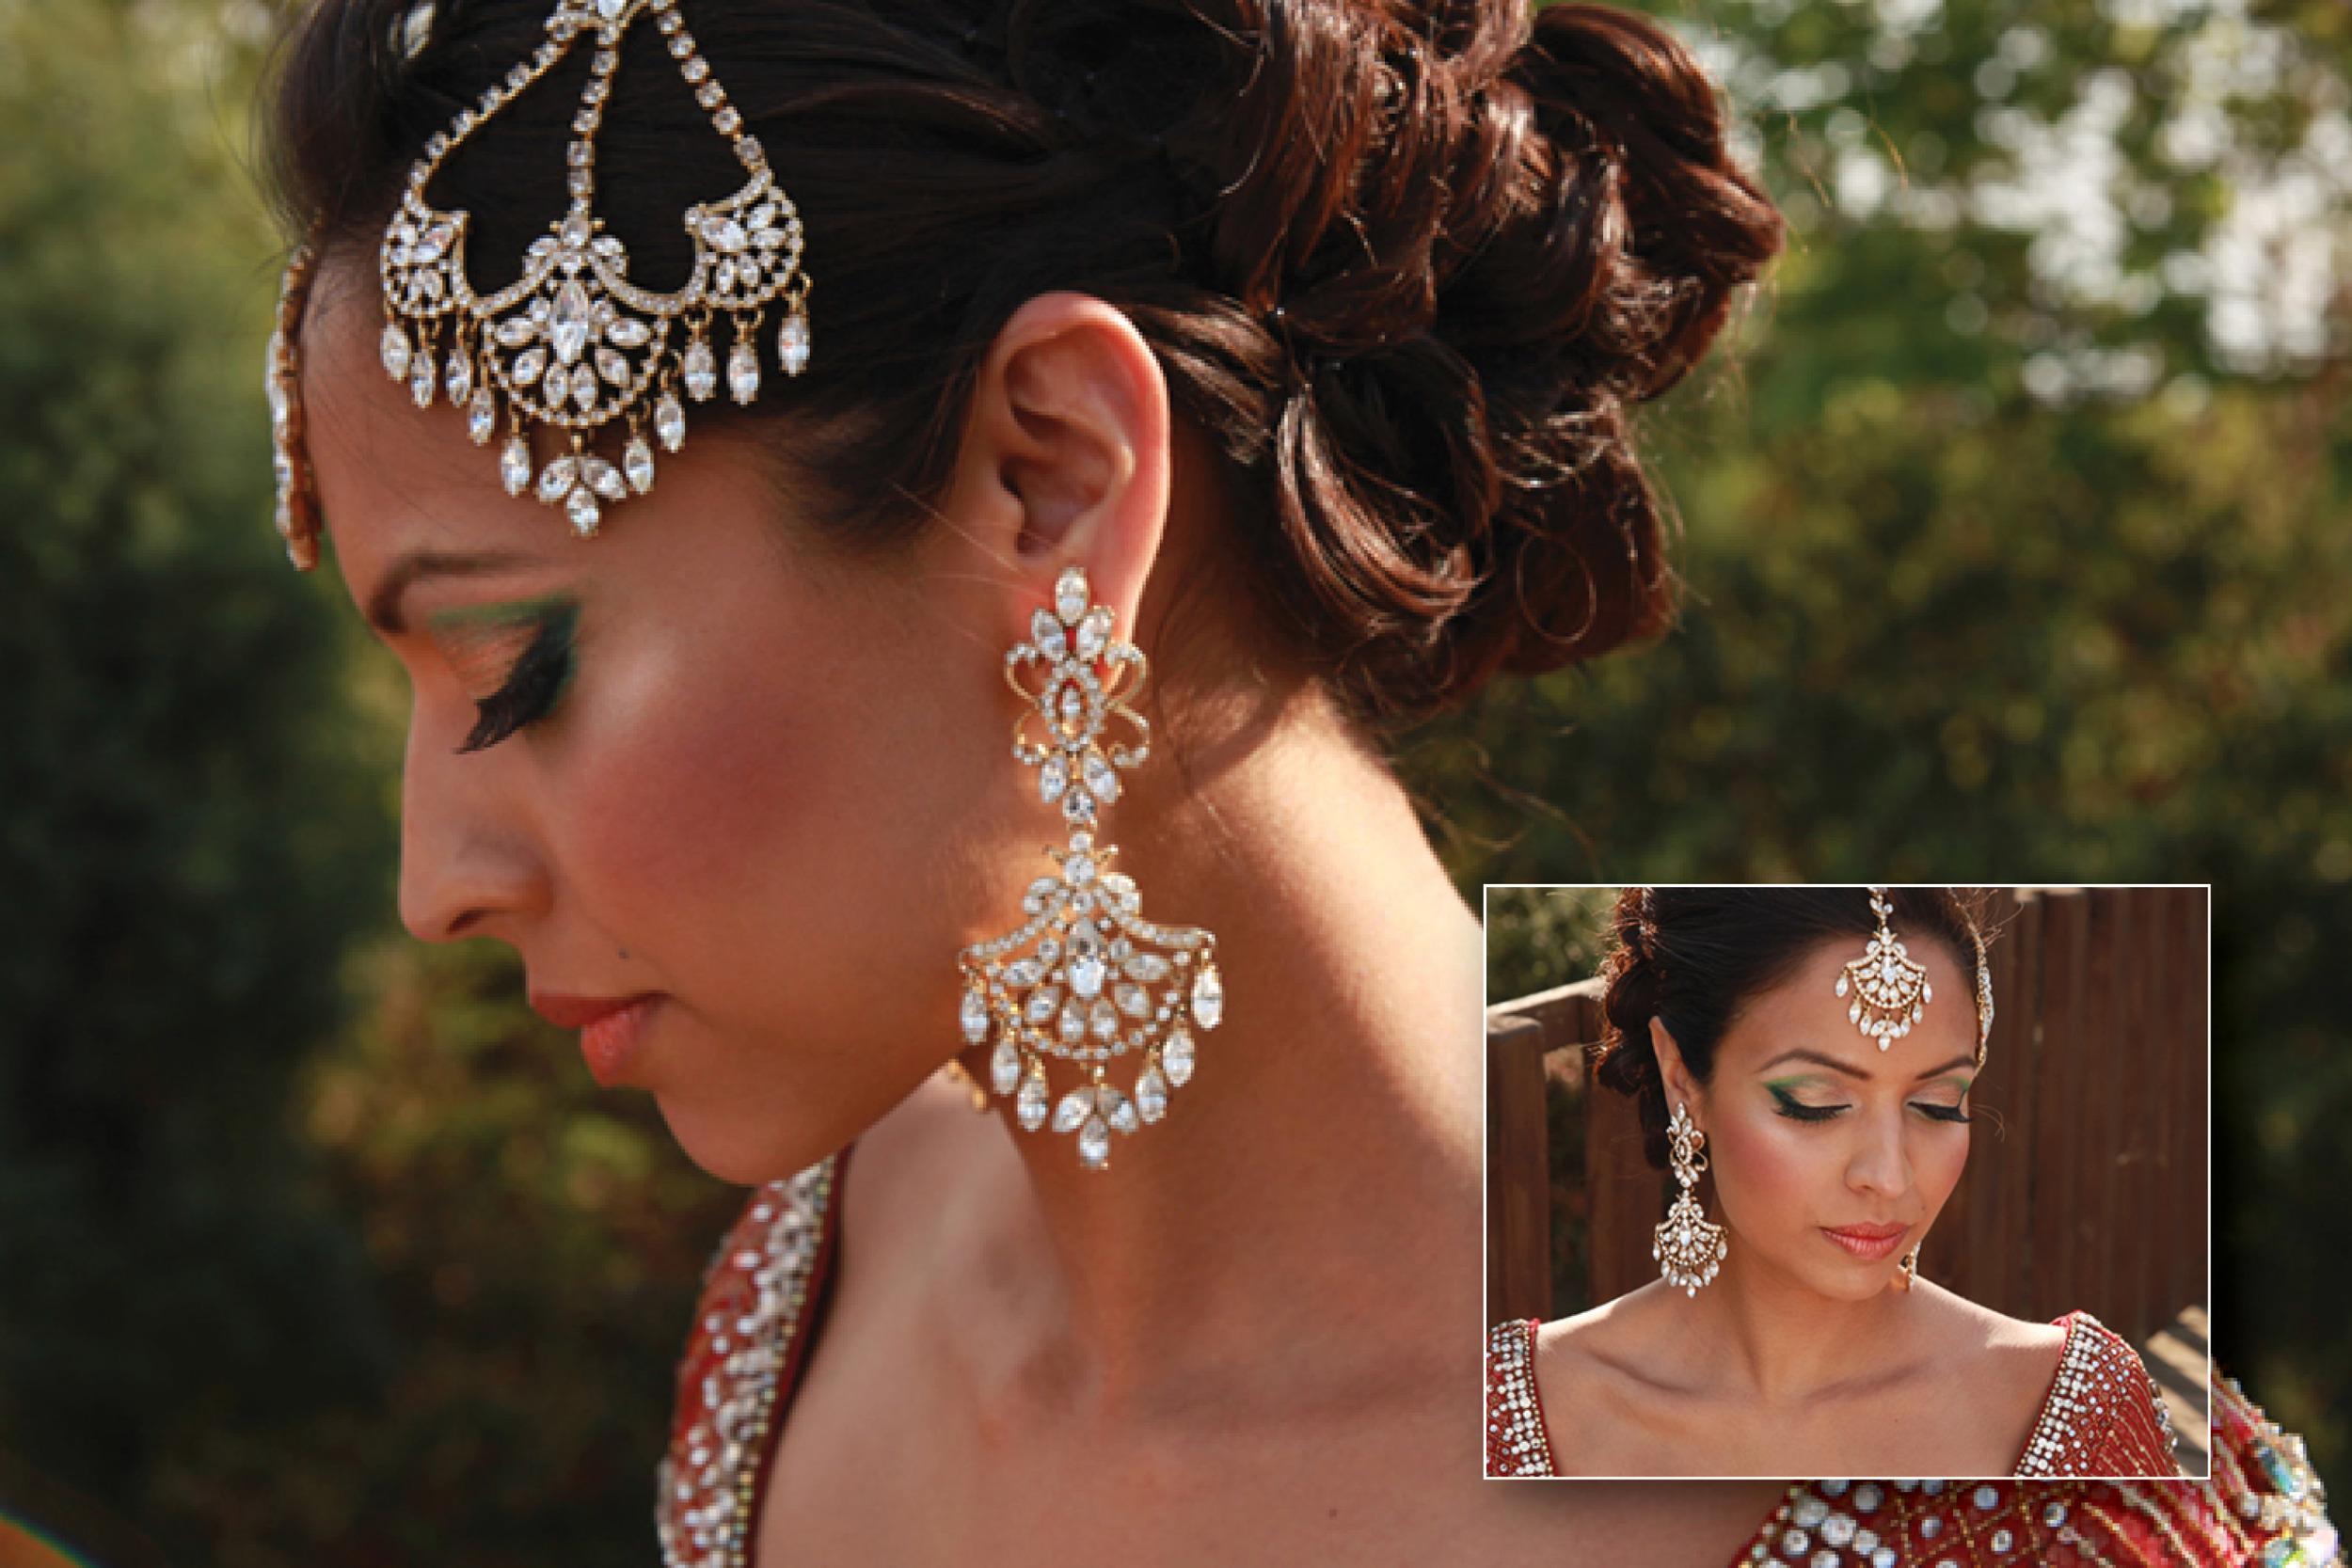 Bridal-makeup-image-33.jpg